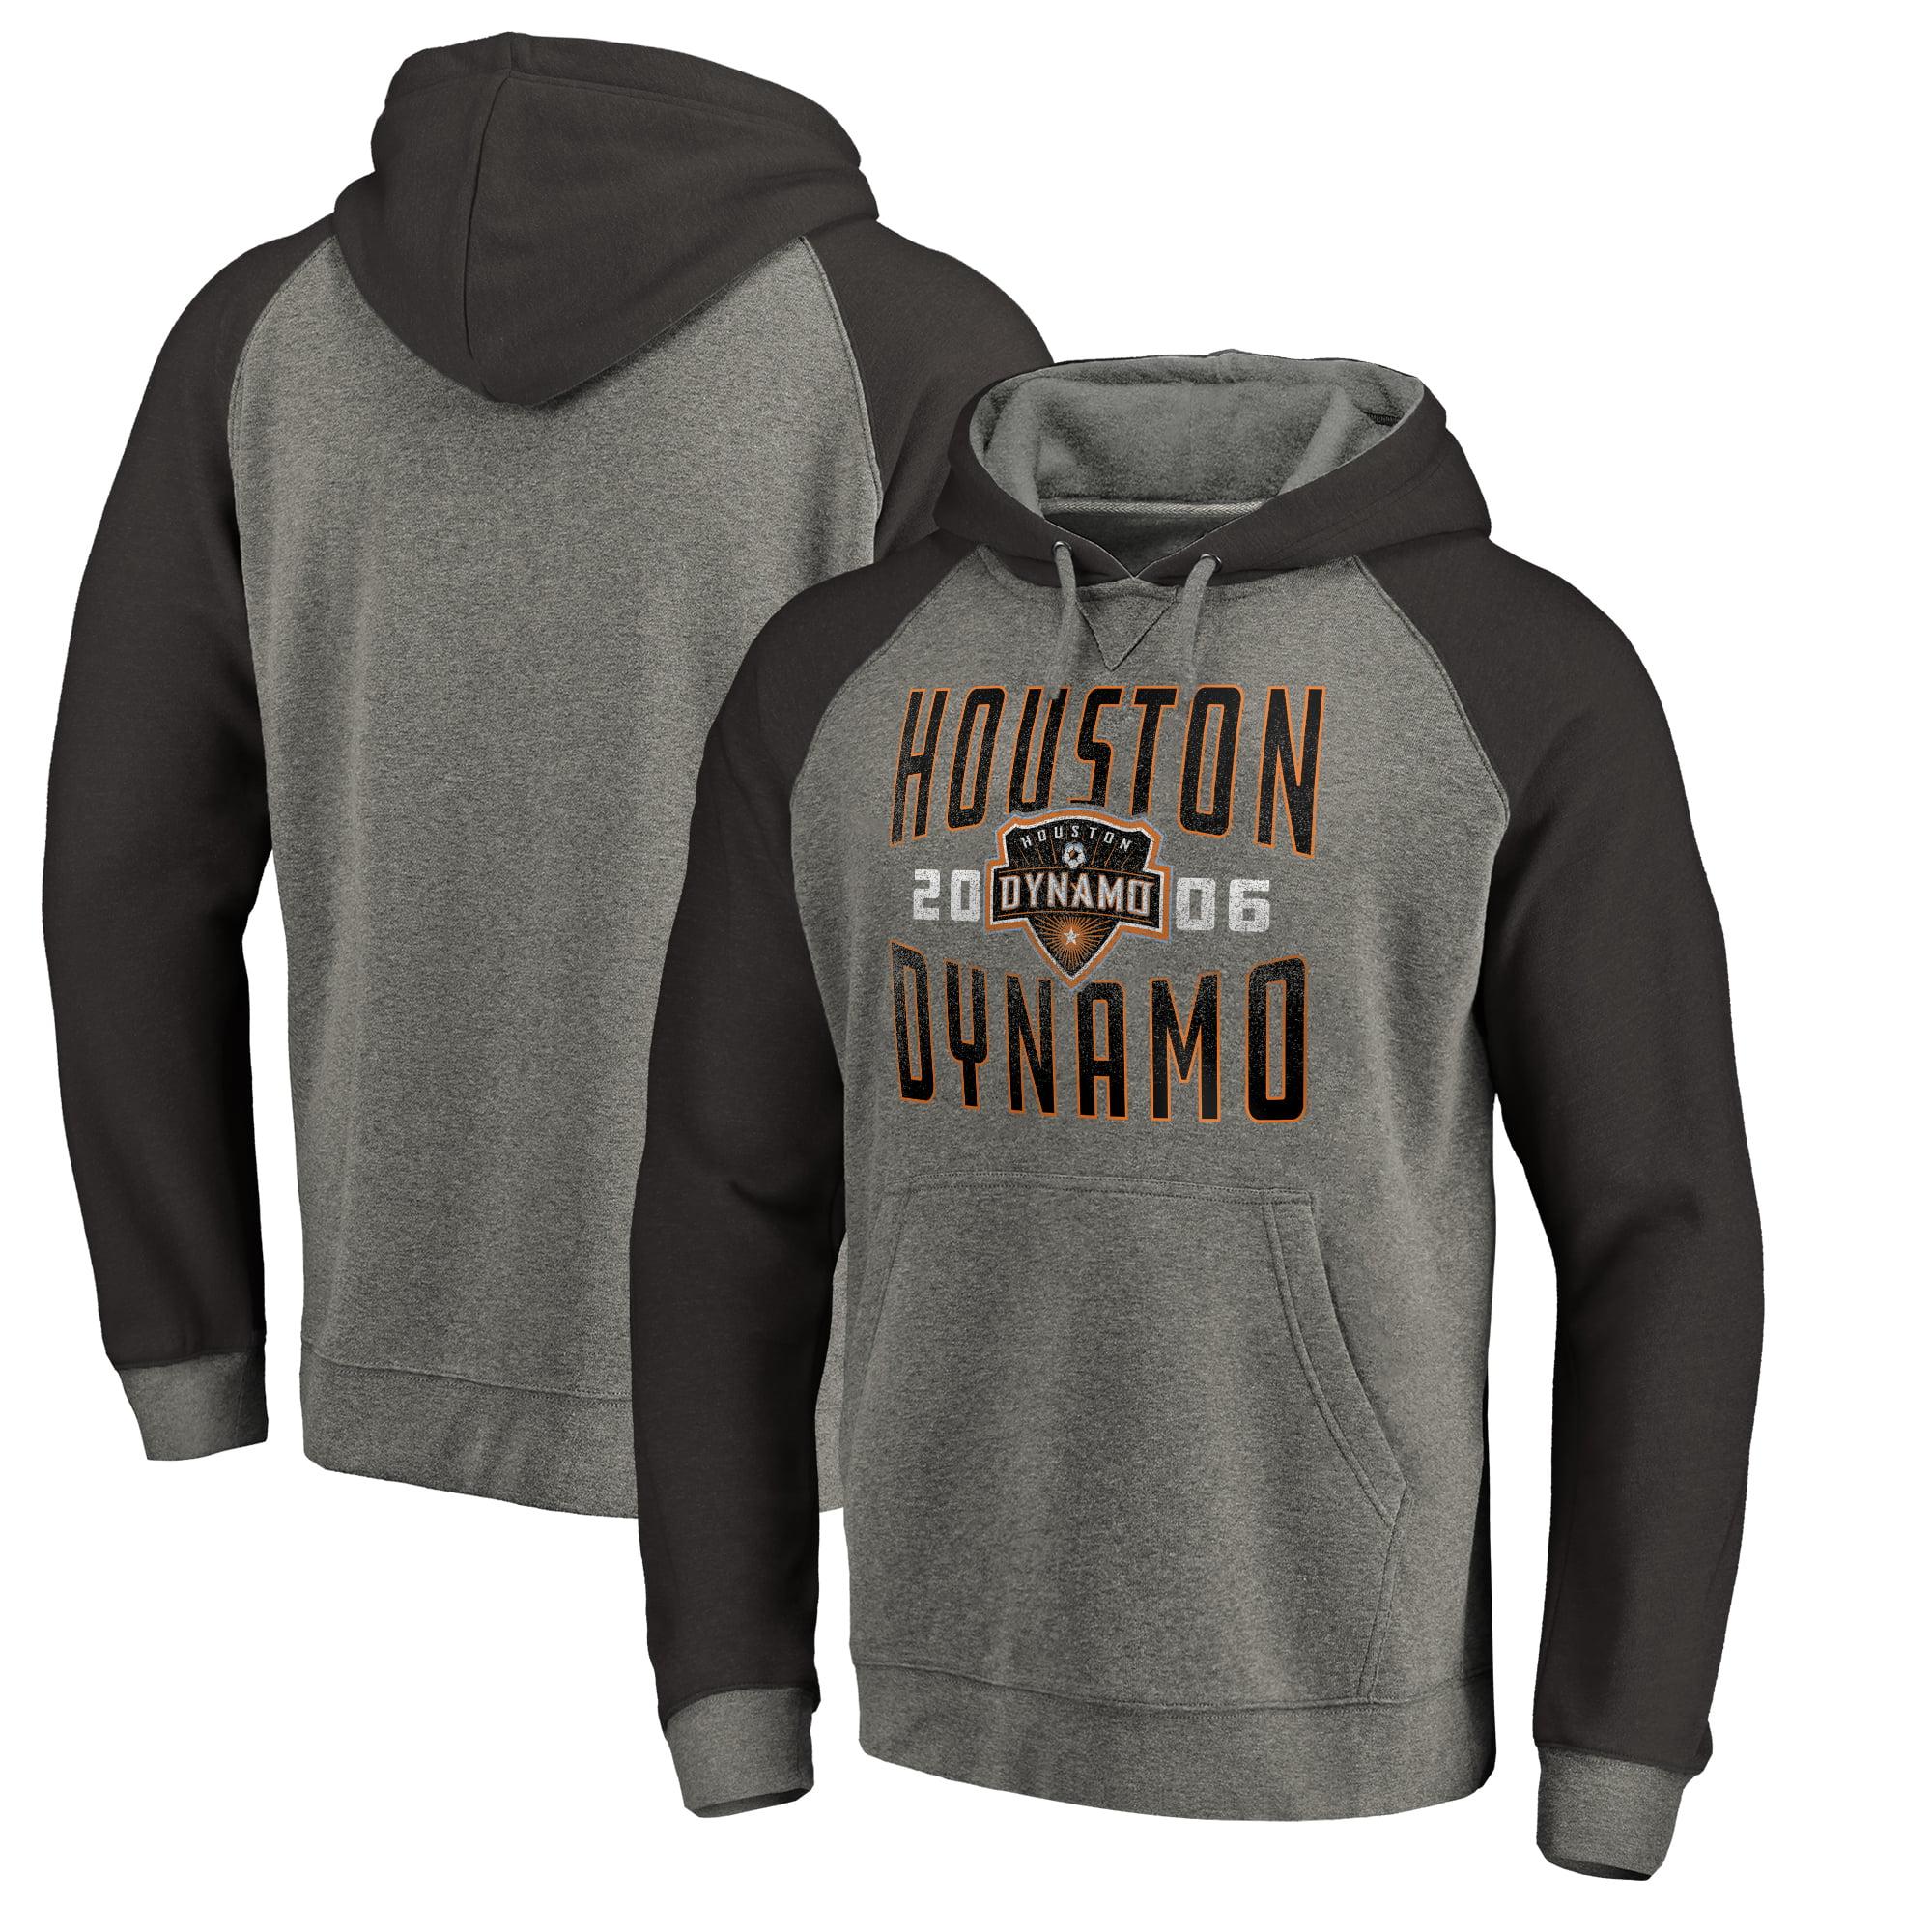 Houston Dynamo Fanatics Branded Antique Stack Tri-Blend Raglan Pullover Hoodie - Heathered Gray